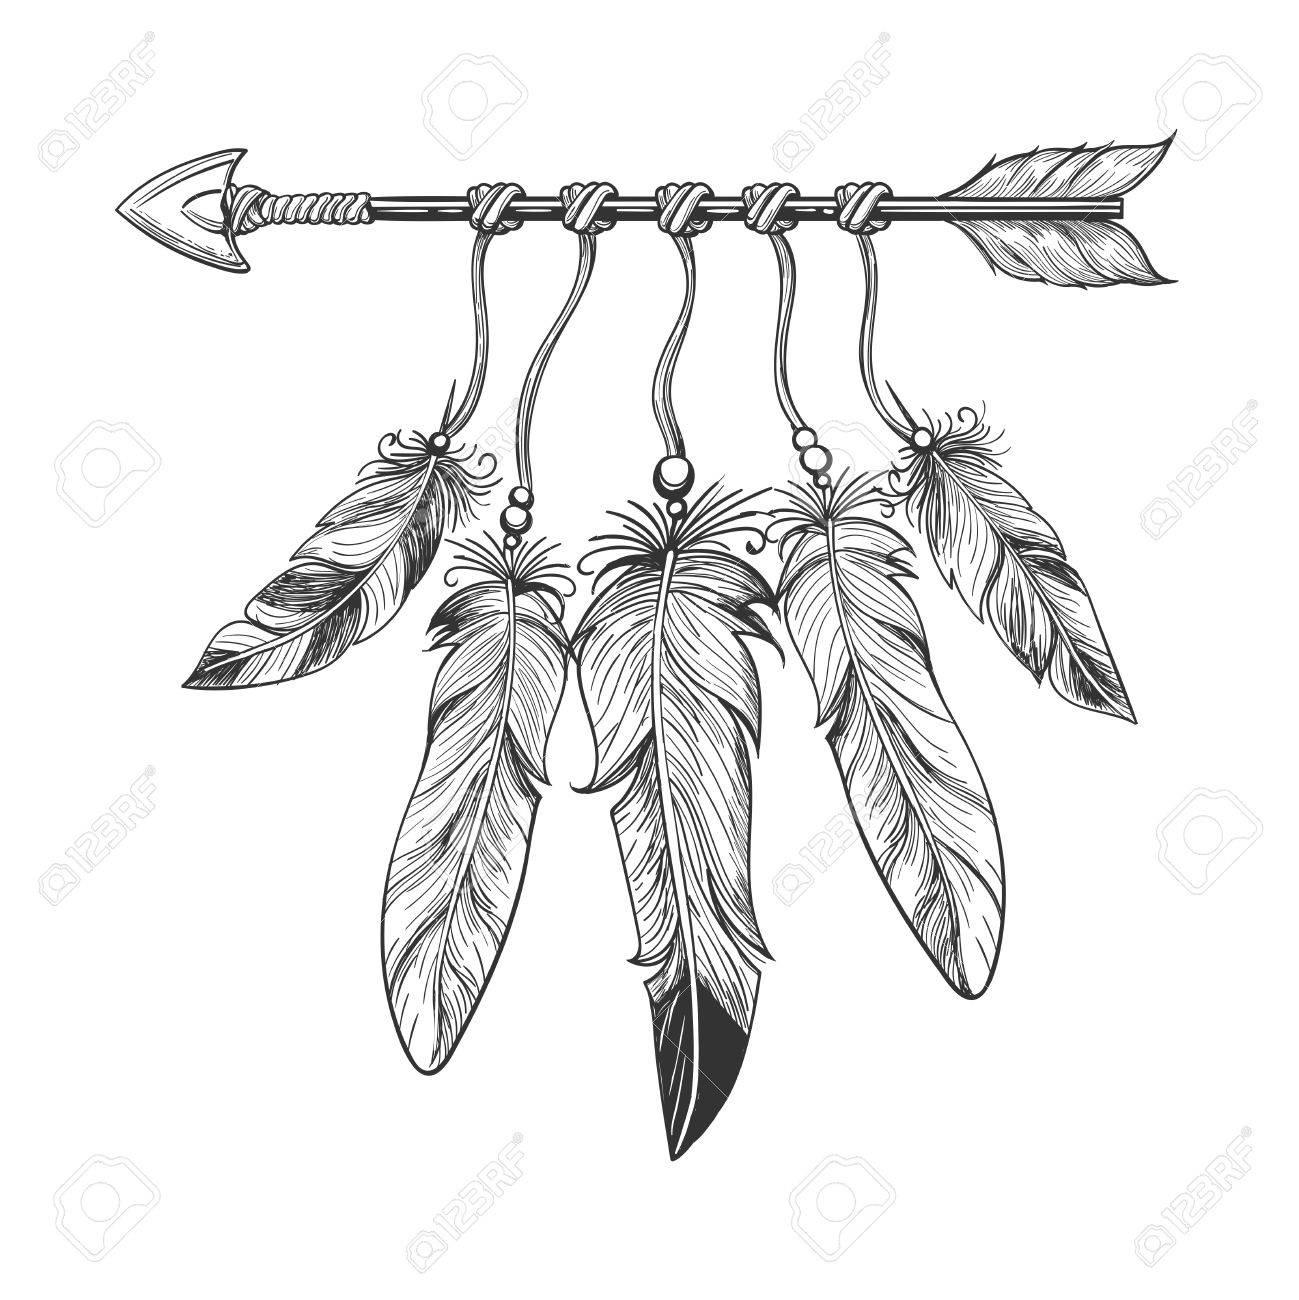 1299x1300 Vintage Nativity Hand Drawn Arrow With Feathers. Tribal Boho